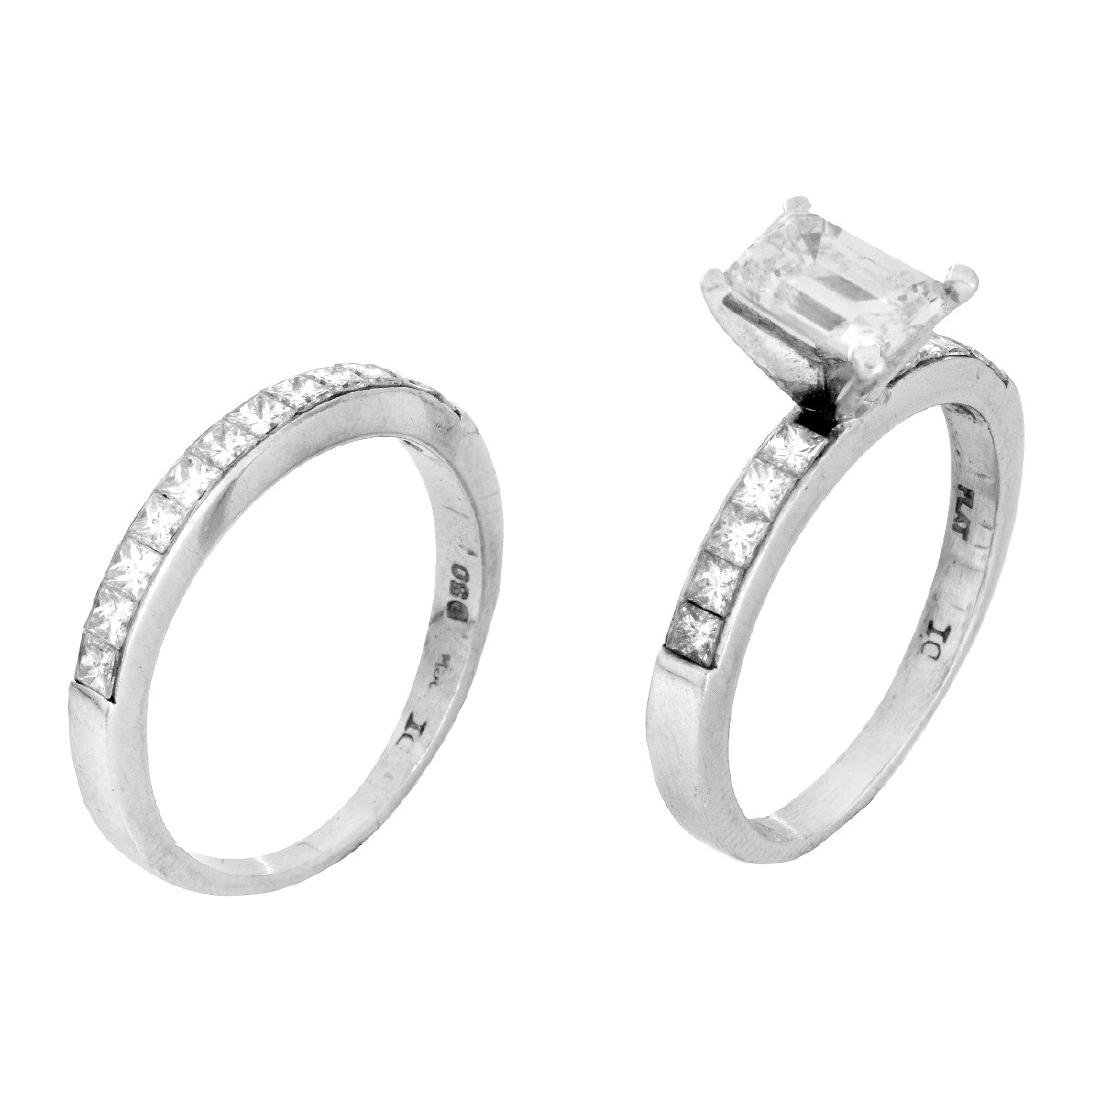 Diamond and Platinum Wedding Set